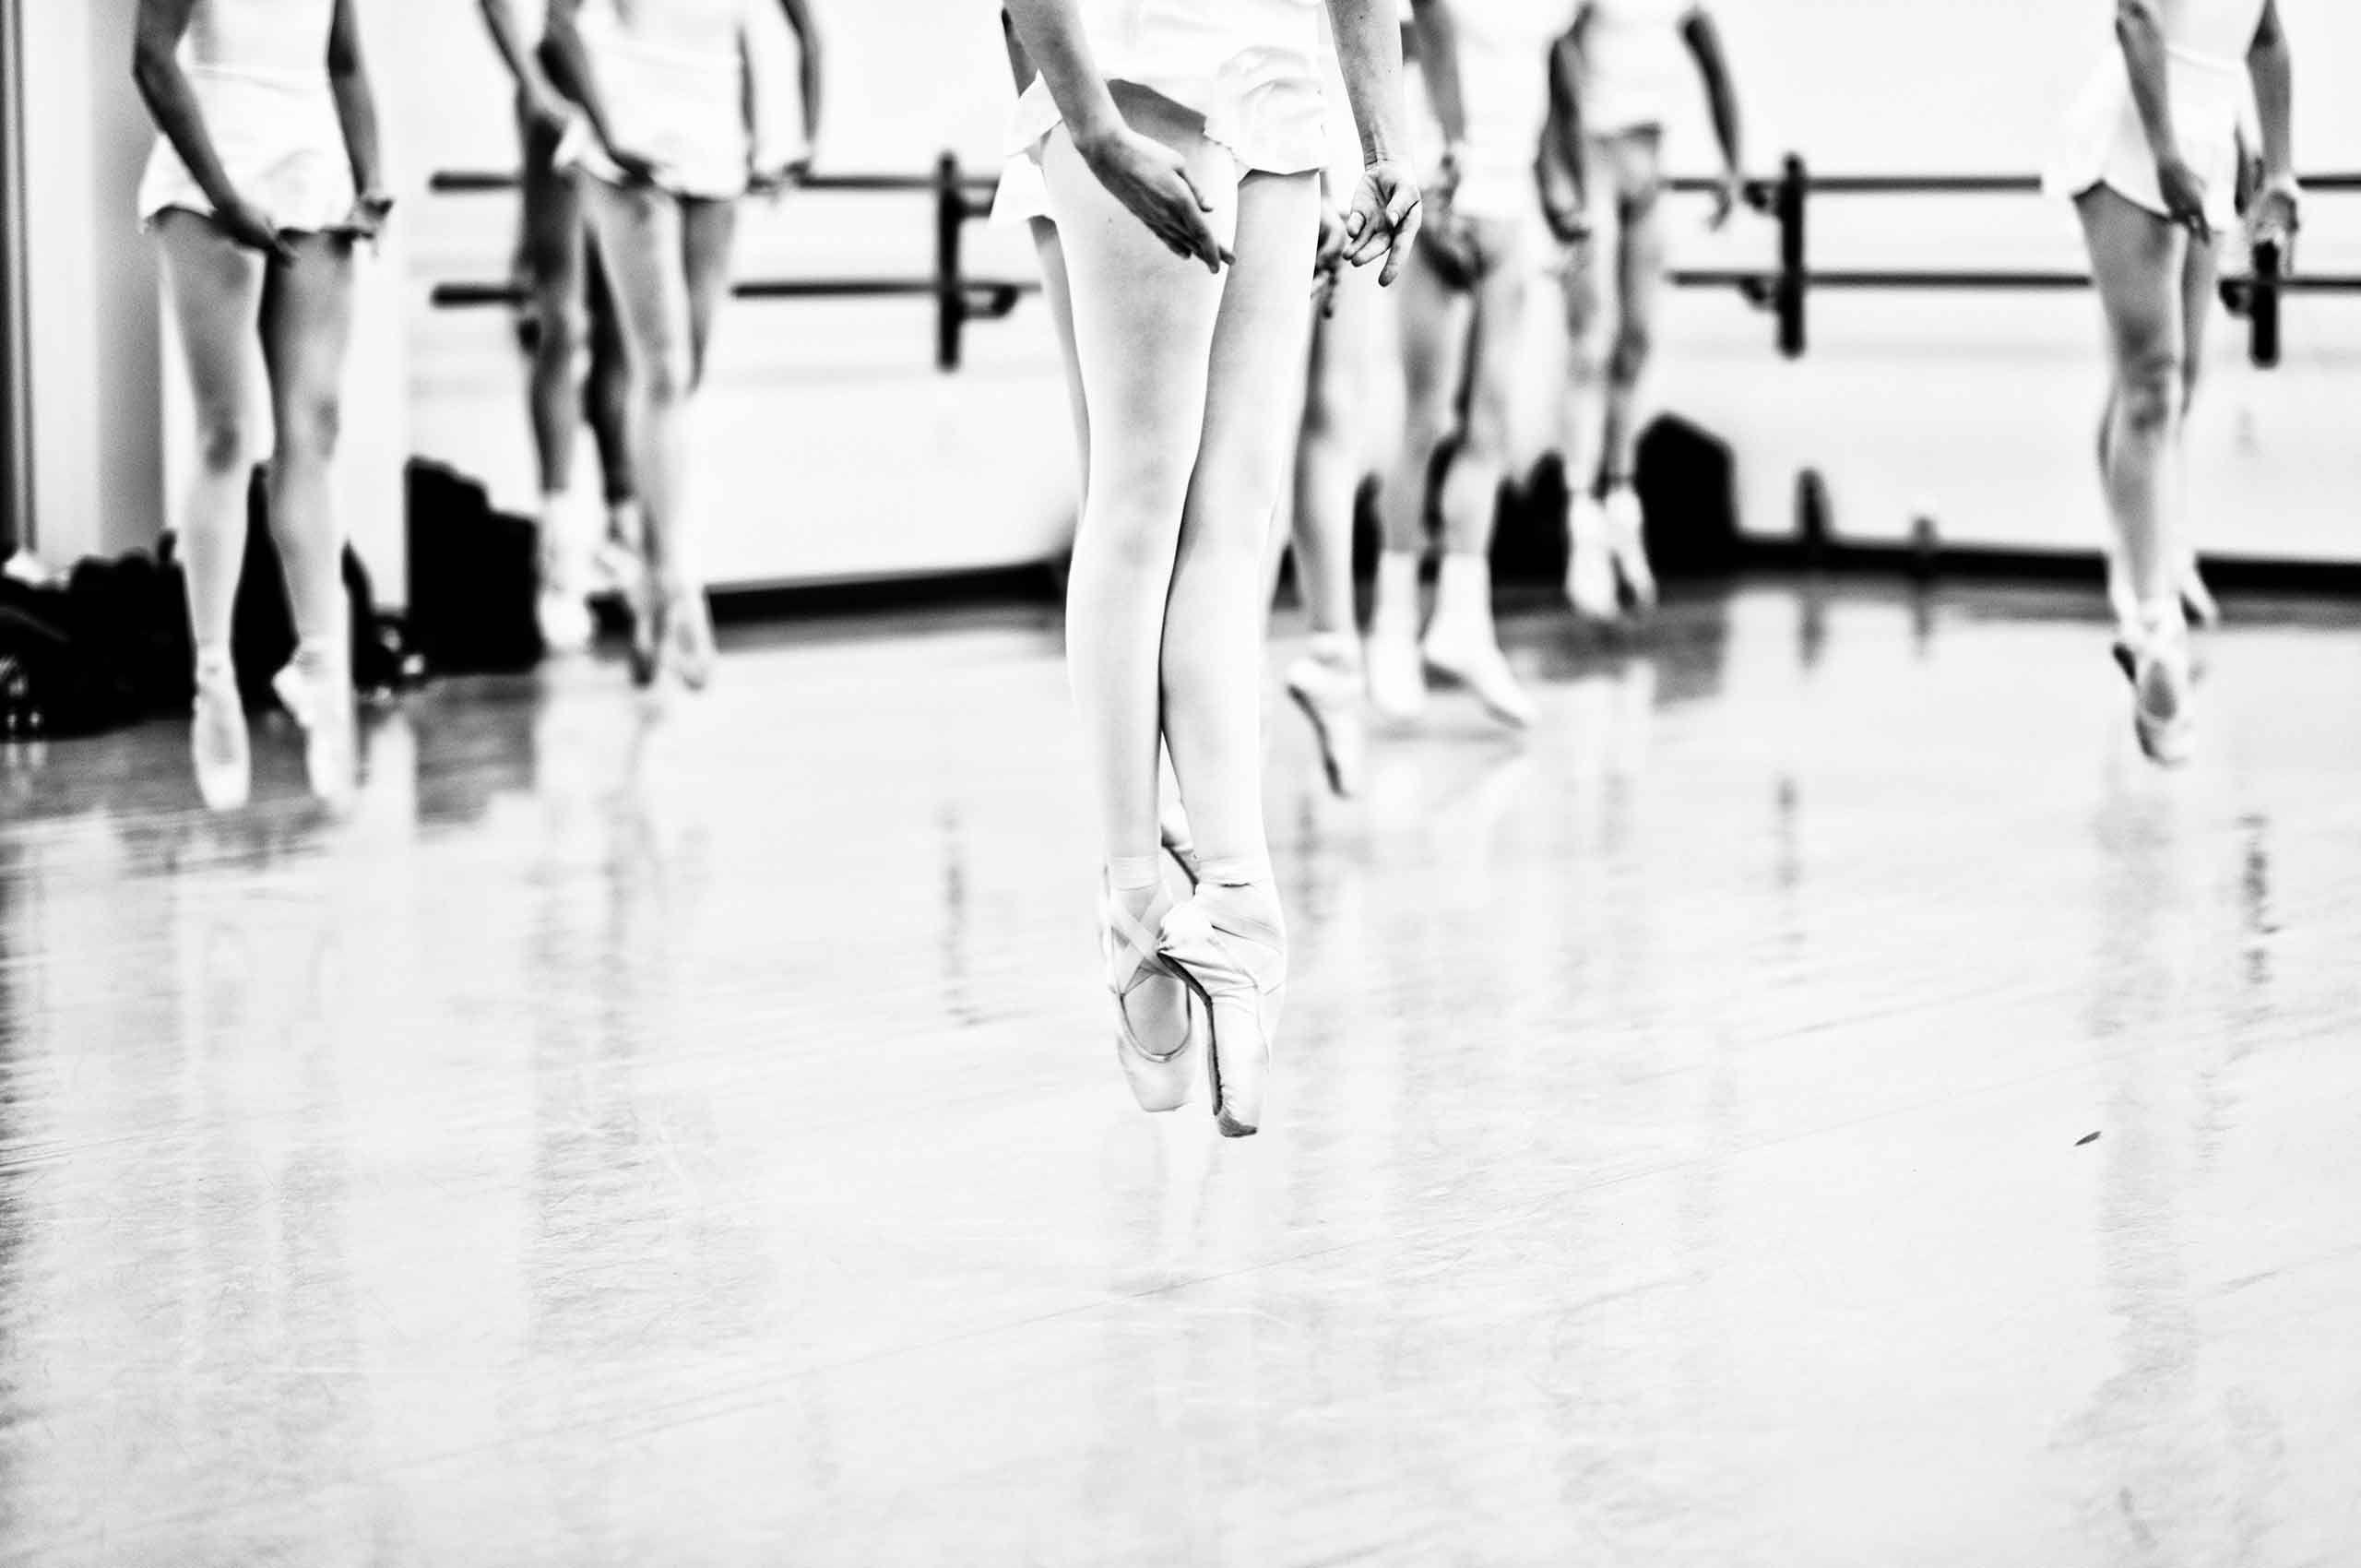 ballerinas-jumping-by-HenrikOlundPhotography.jpg